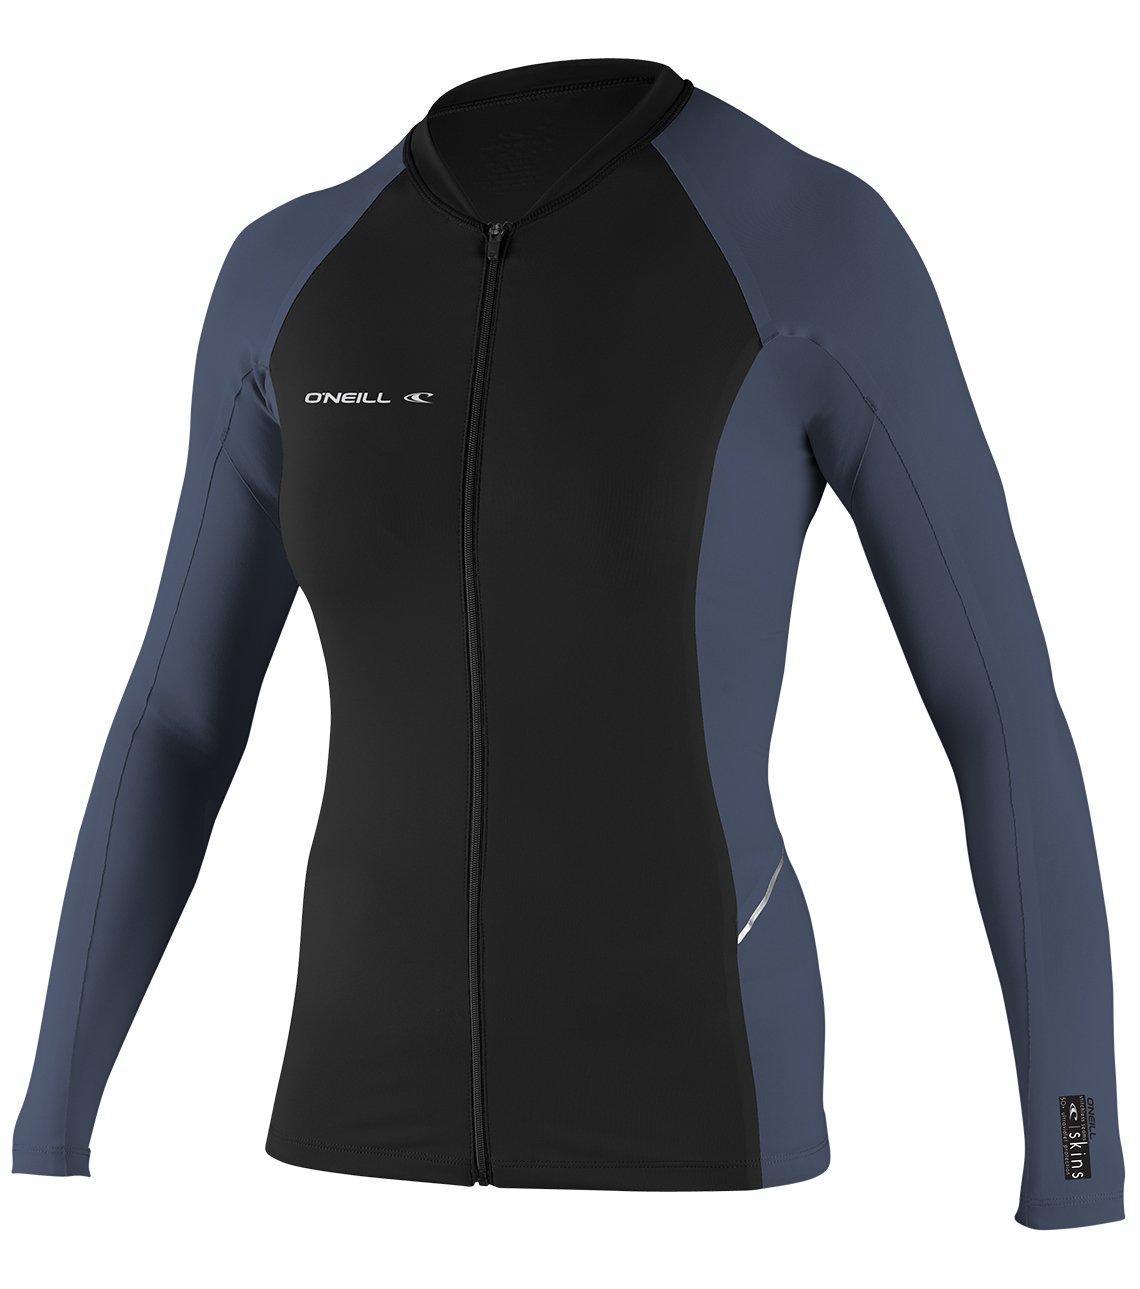 O'Neill Women's Premium Skins Stitchless UPF 50+ Long Sleeve Full Zip Jacket, Black/Mist, Small